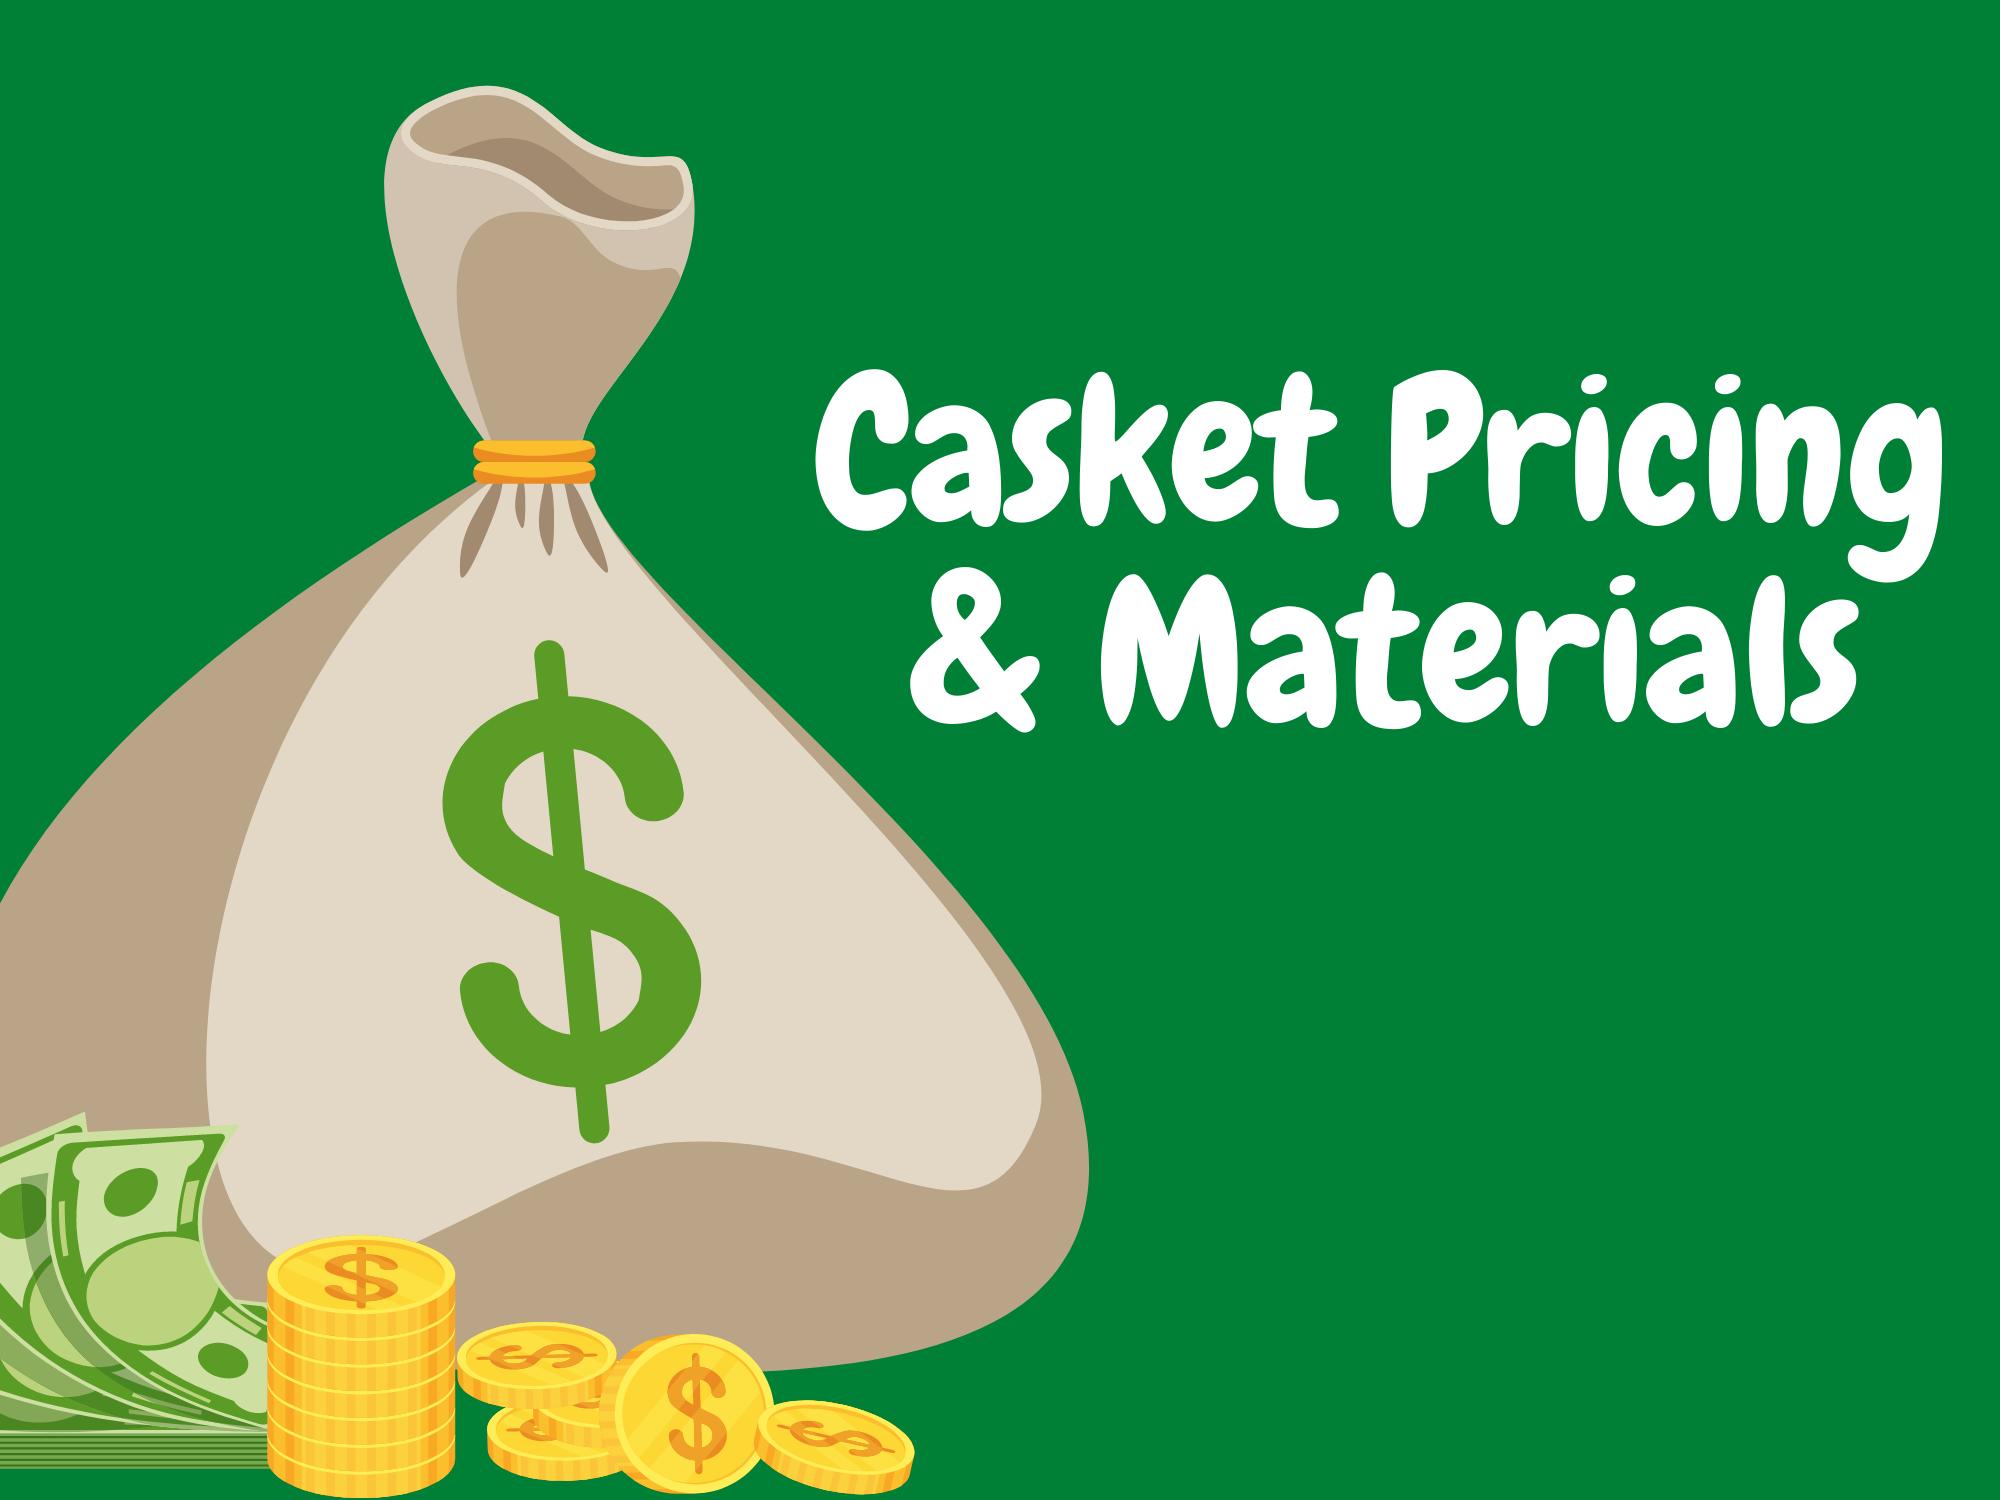 Casket-Pricing-Materials